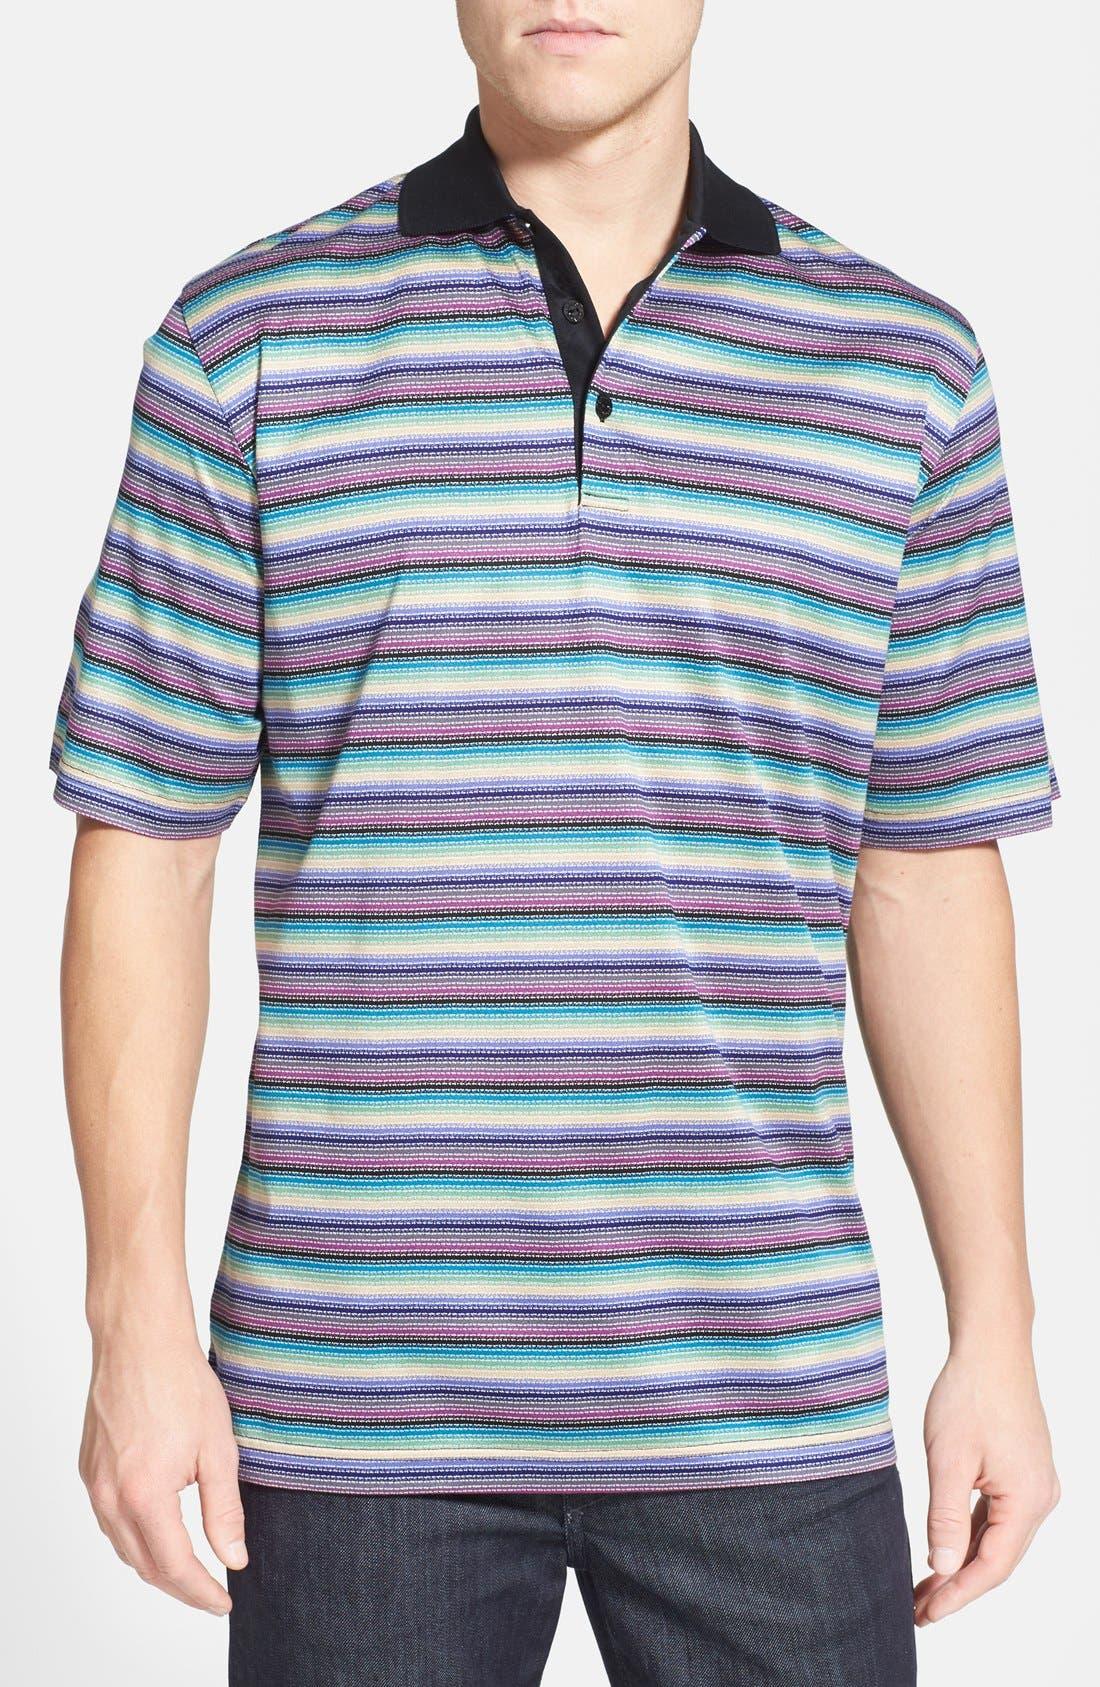 Alternate Image 1 Selected - Bugatchi Stripe Mercerized Cotton Polo